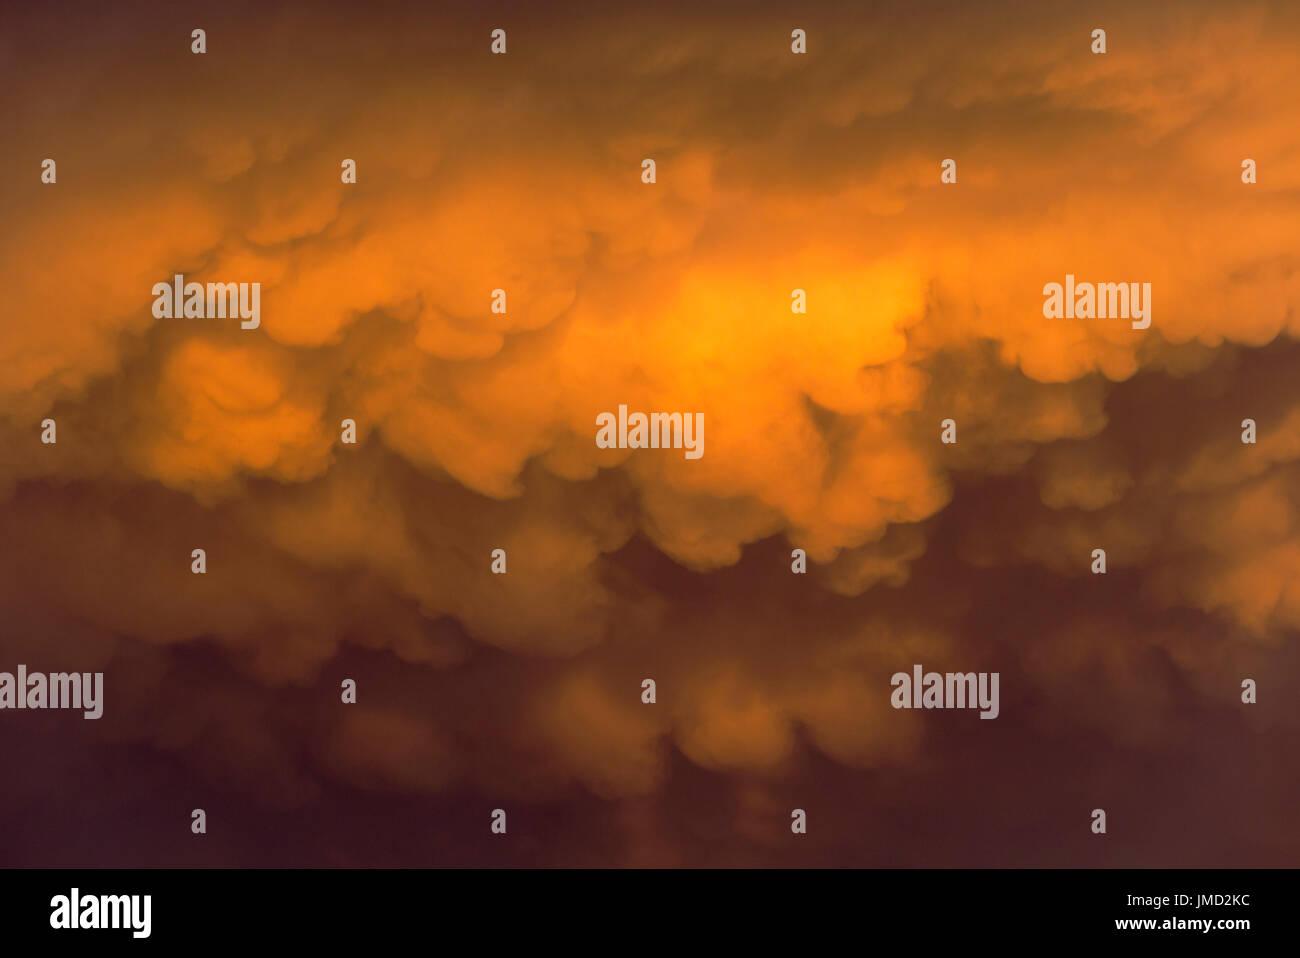 Cumulonimbus cloud in the evening during the rainy season. Kalahari Desert, Kgalagadi Transfrontier Park, South Africa. - Stock Image